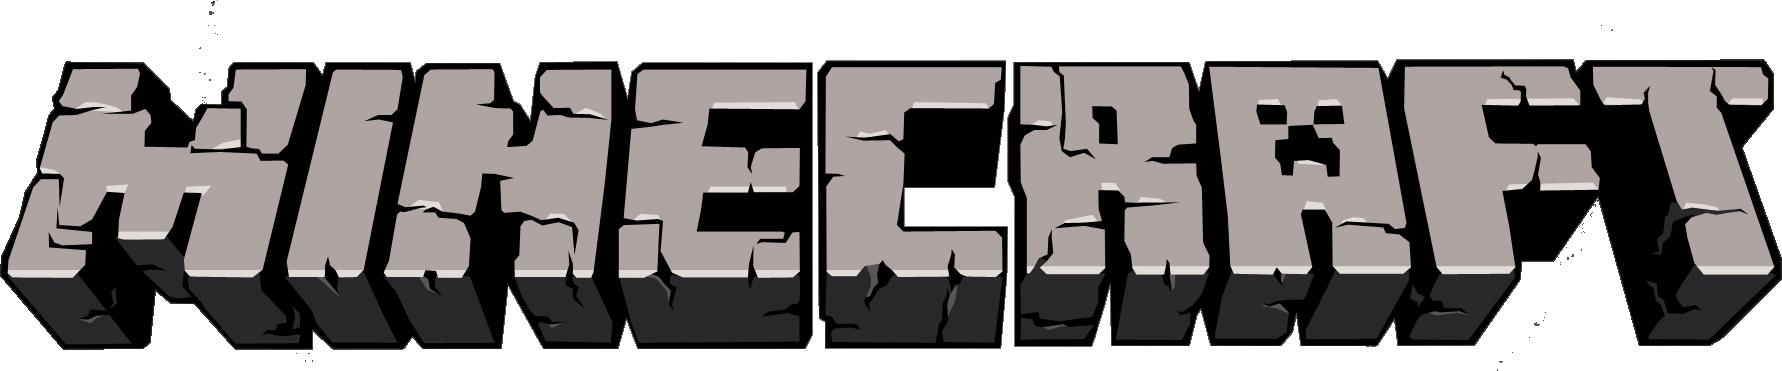 Minecraft Clipart Svg Minecraft Svg Transparent Free For Download On Webstockreview 2020